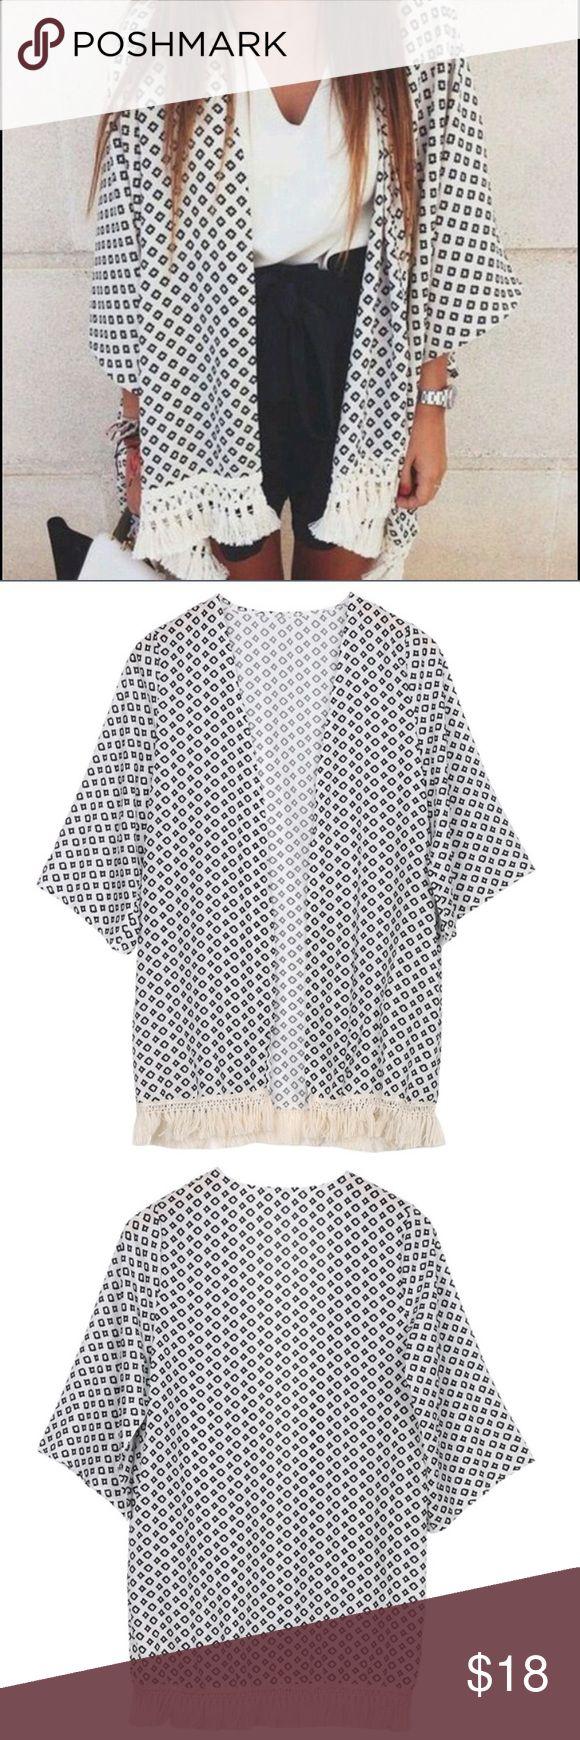 NWT Retro Boho Kimono Cardigan NWT Retro Boho Kimono Cardigan. Size M. Smoke and Pet Free Home. Bundle and Save! Tops